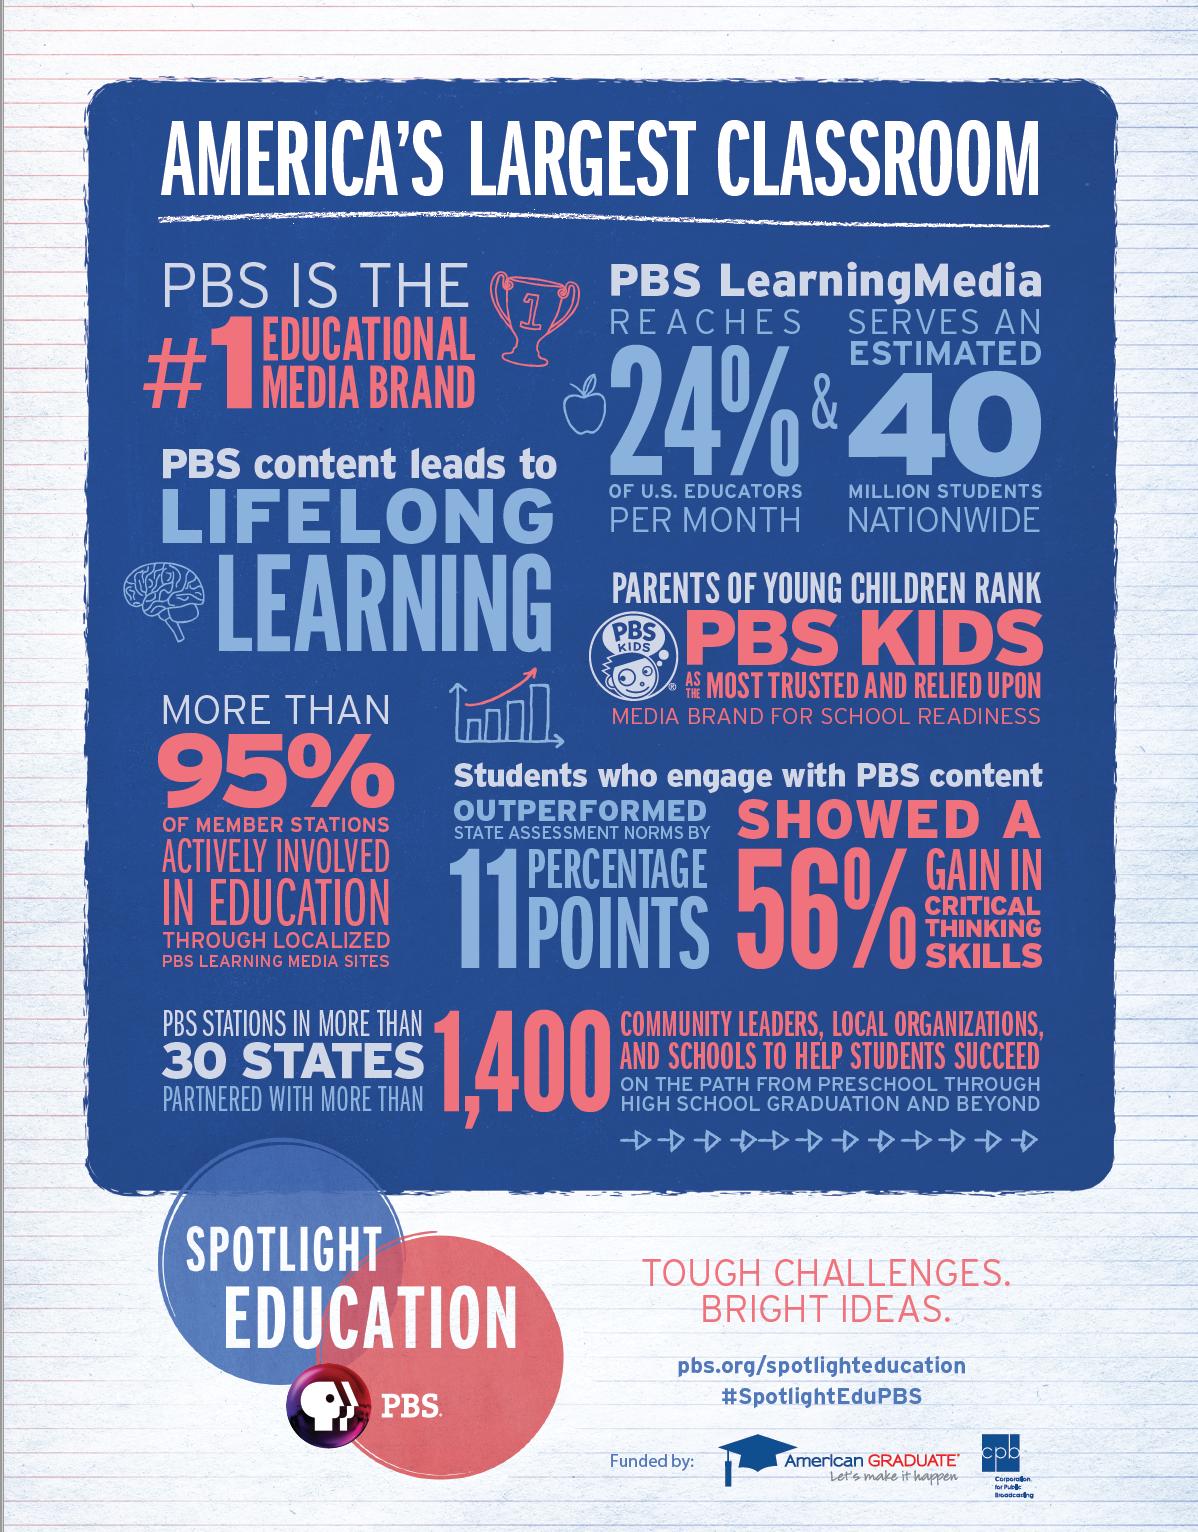 America's Largest Classroom